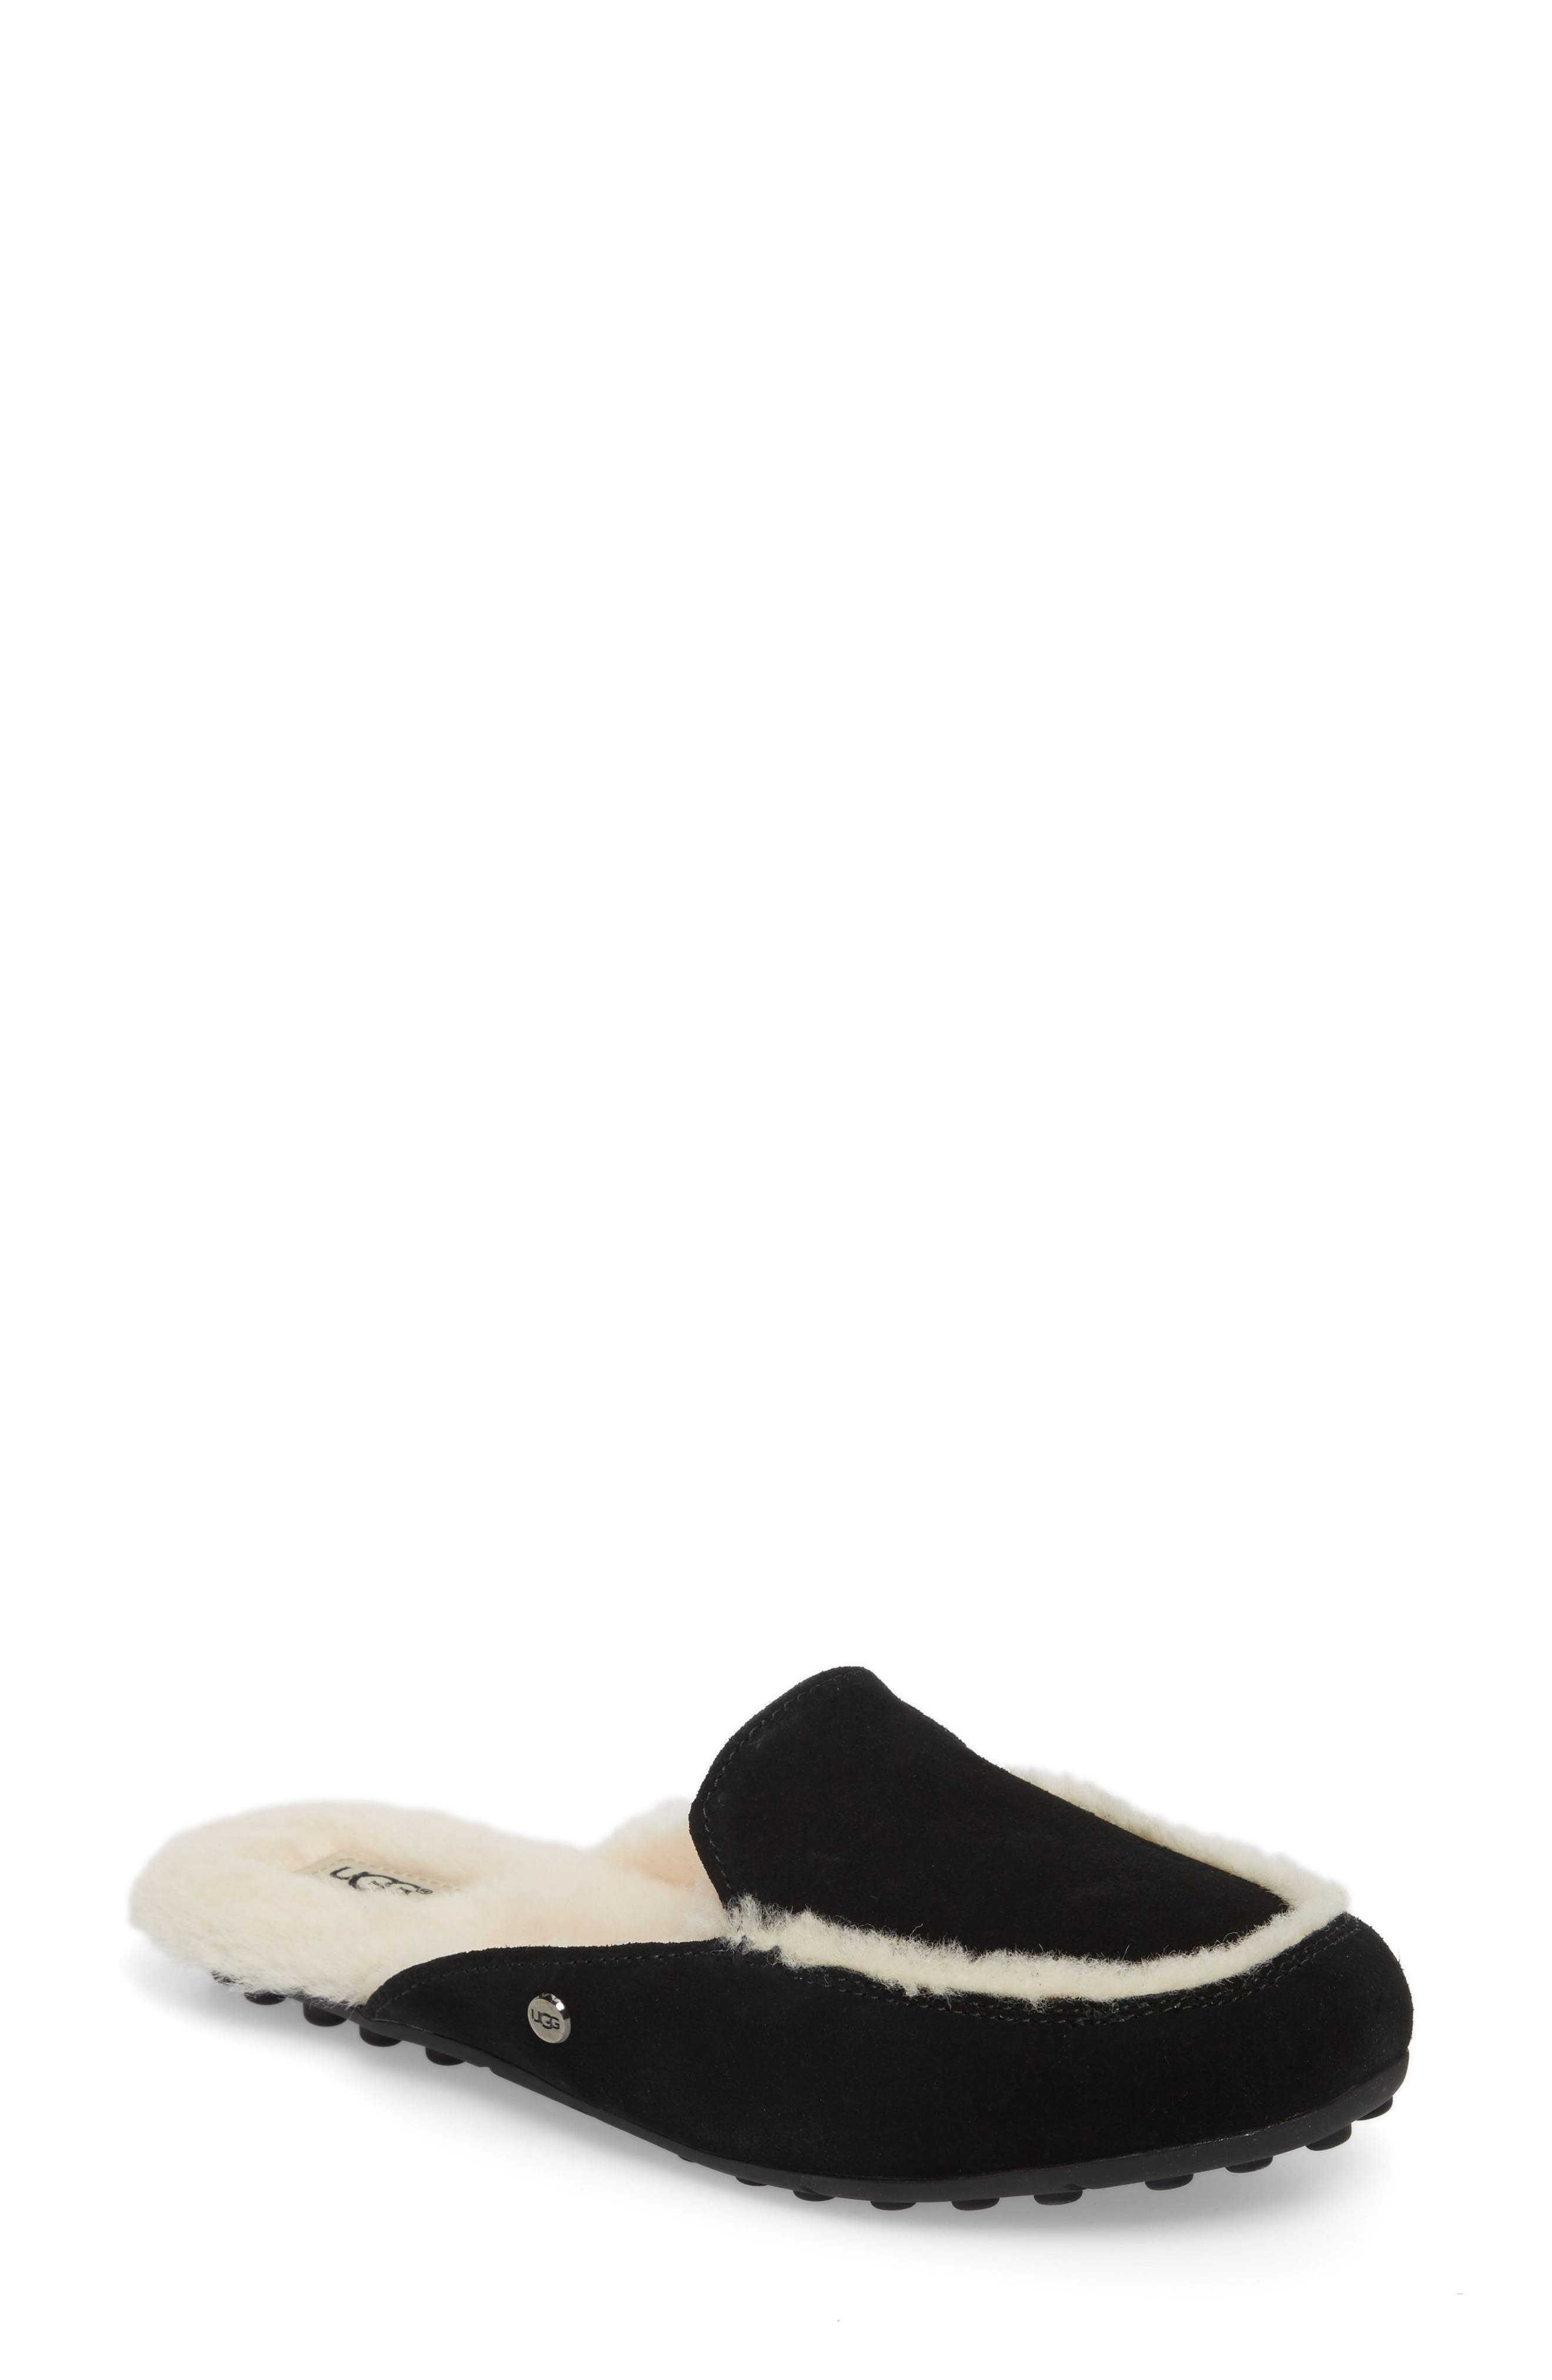 Ugg Lane Genuine Shearling Slipper, Black